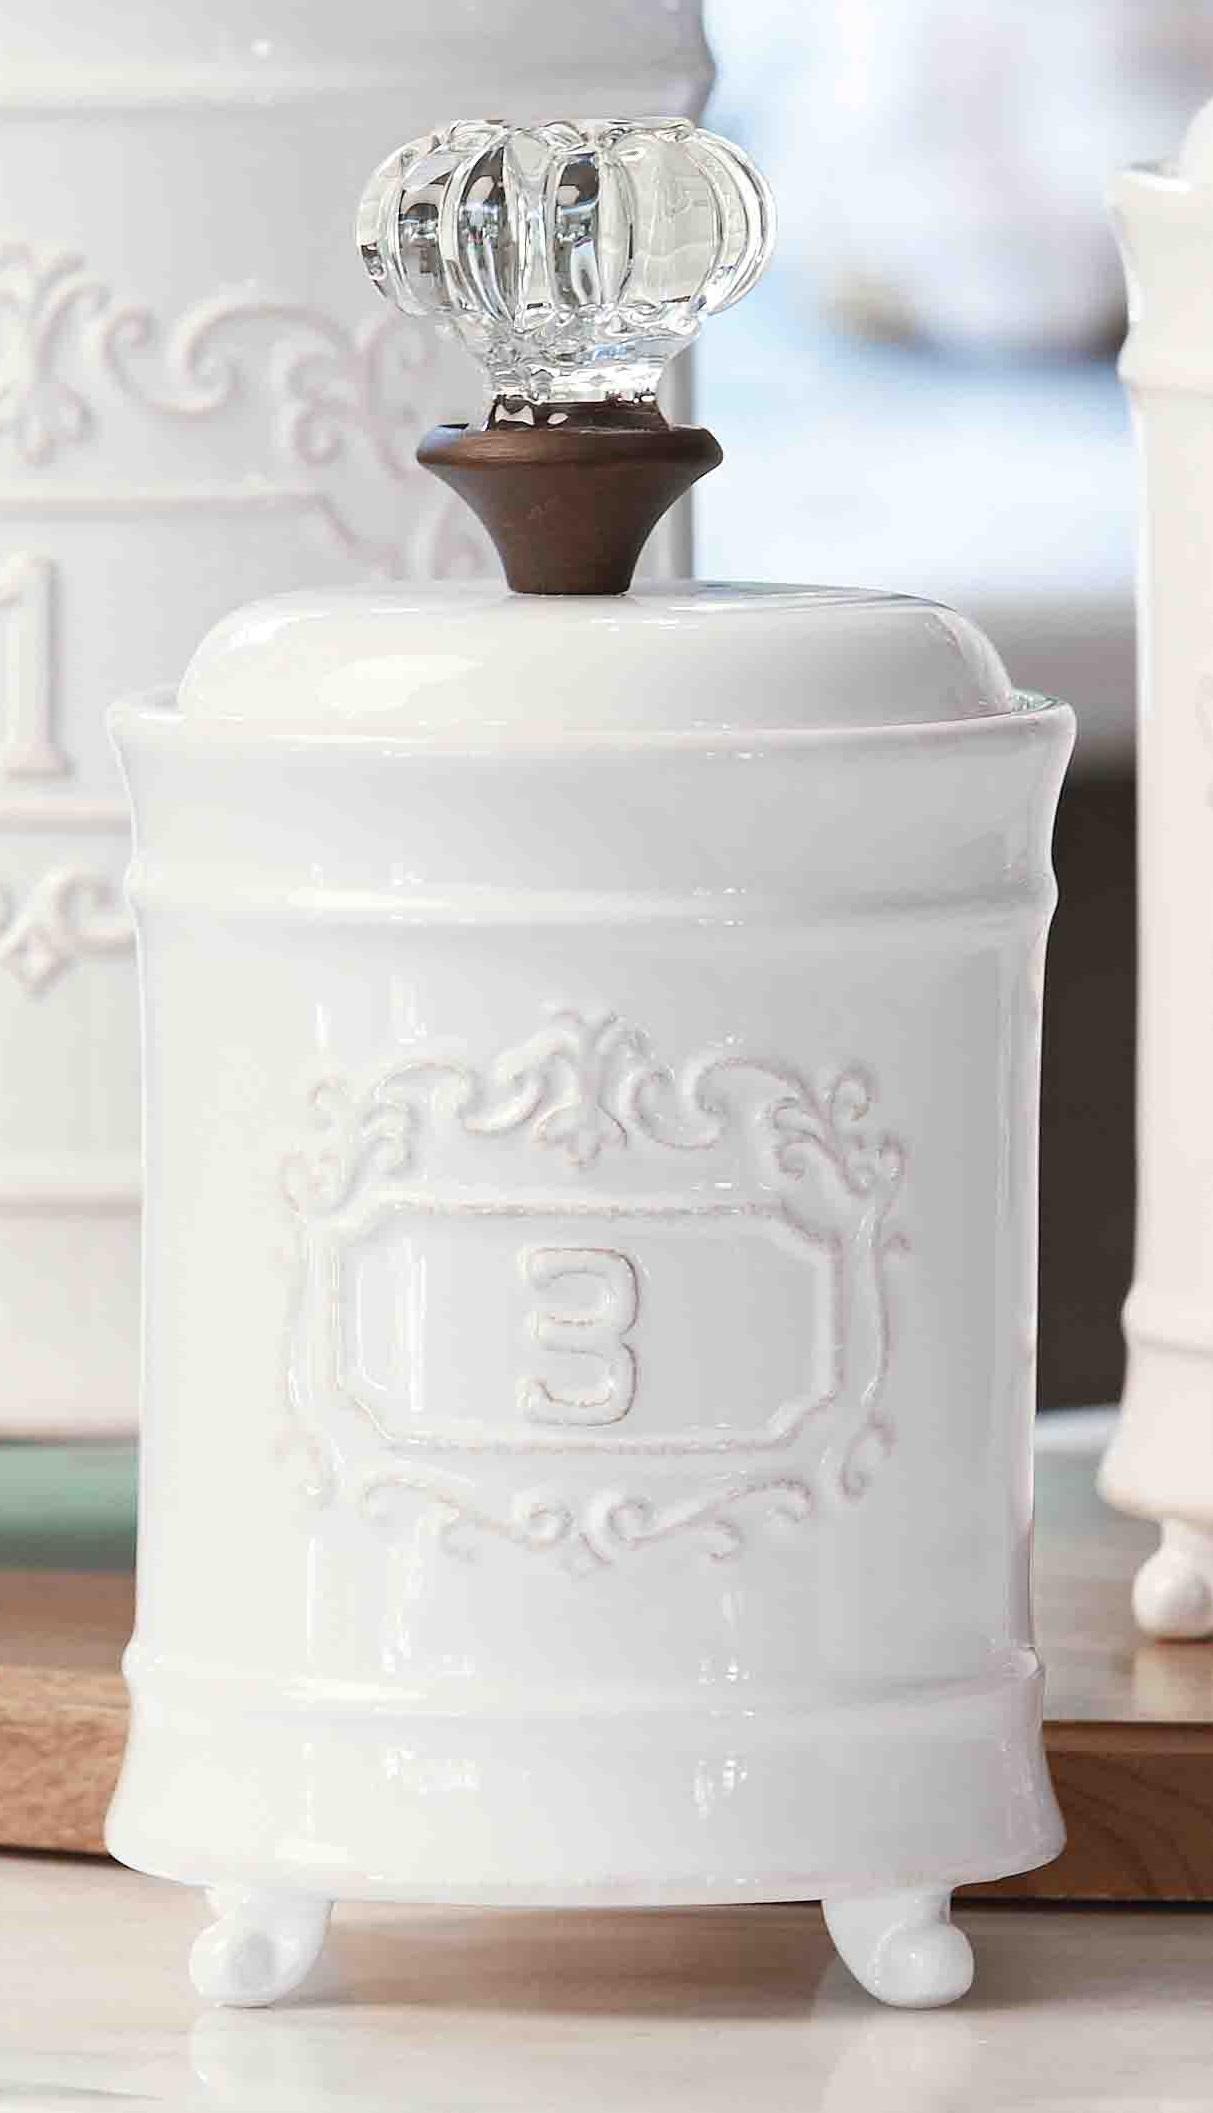 Mud Pie Kitchen Door Knob Ceramic Small Canister